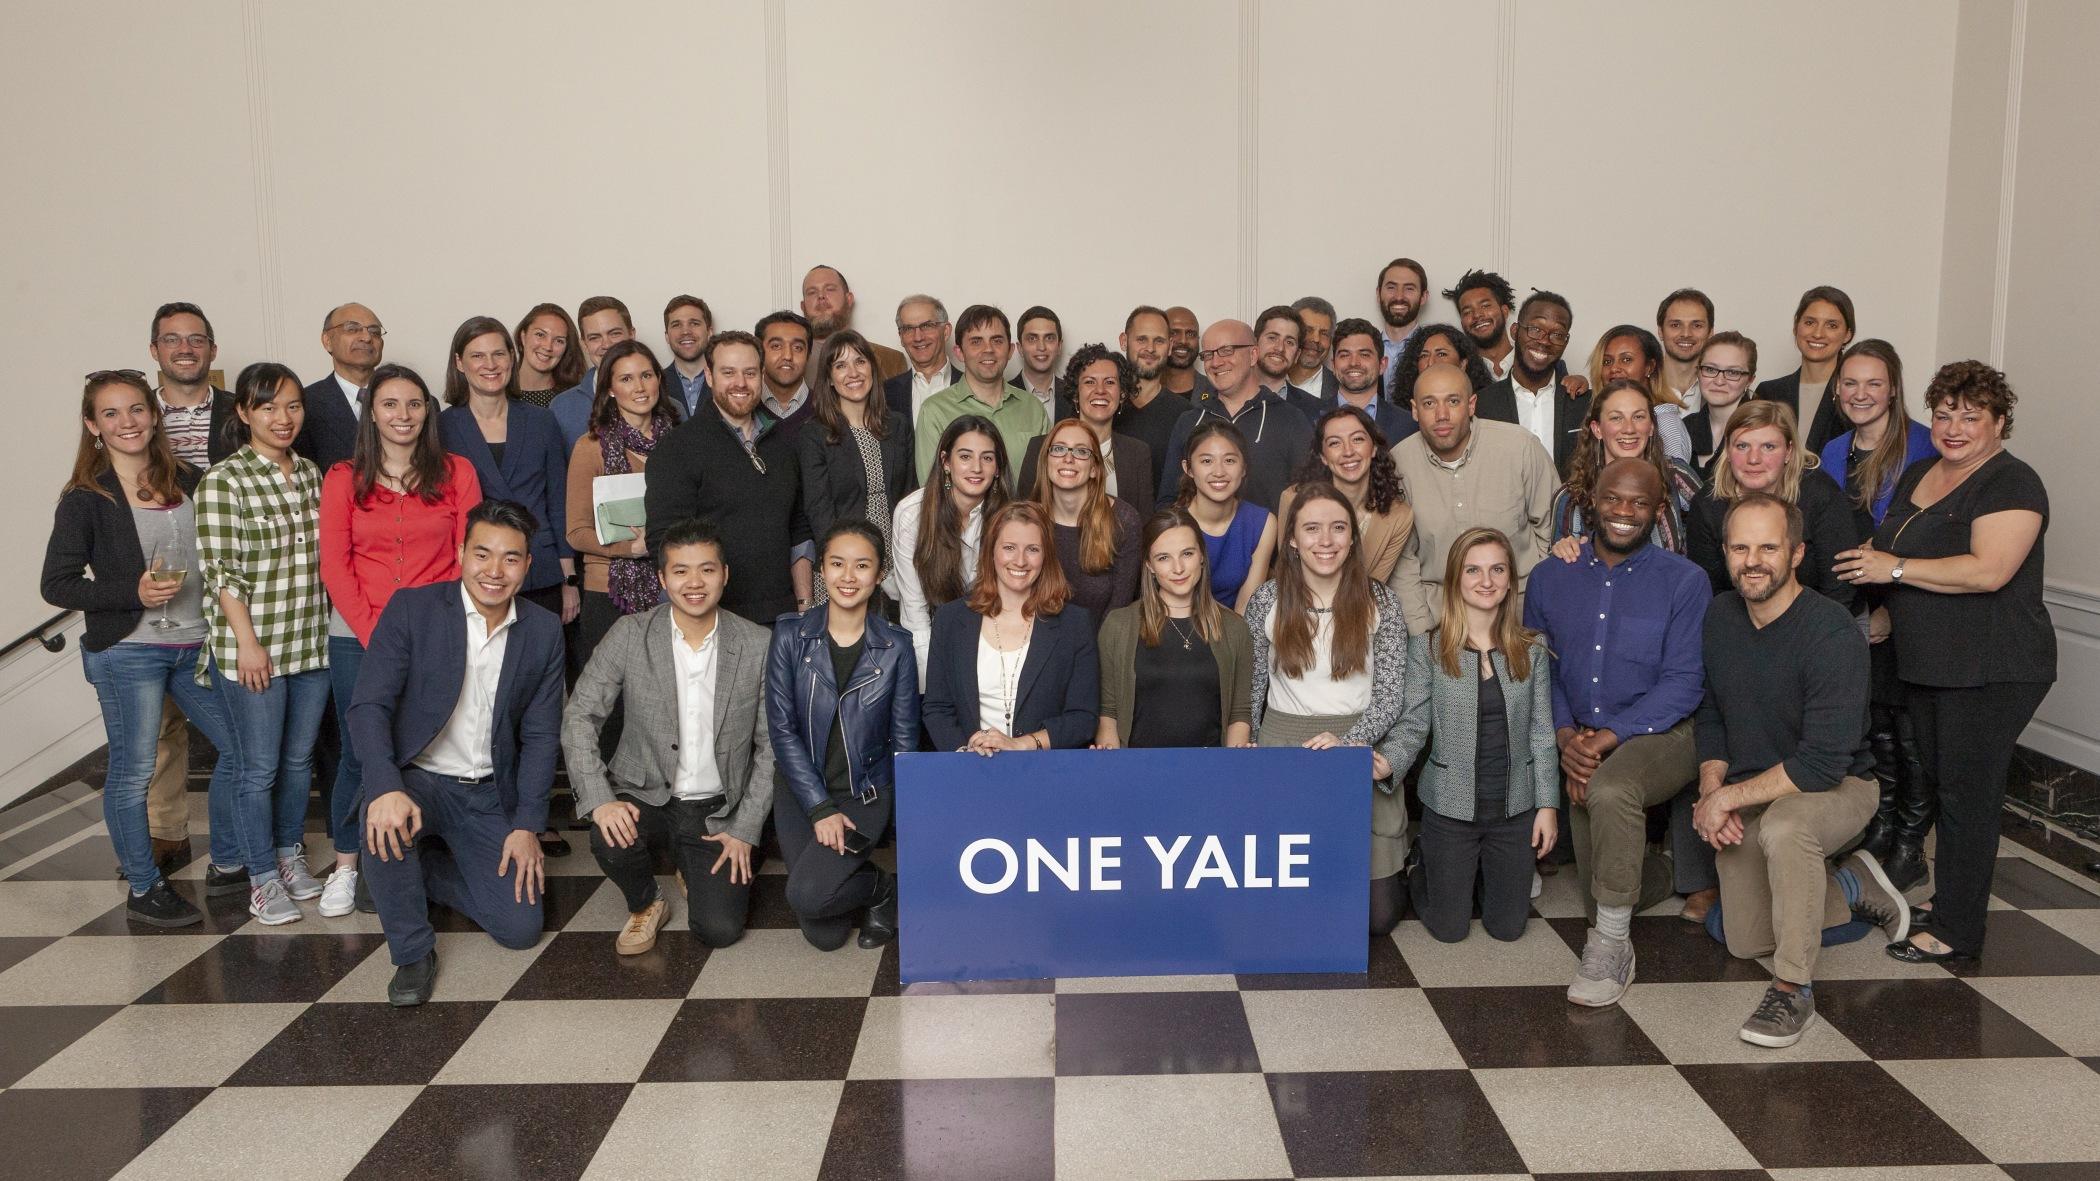 One Yale